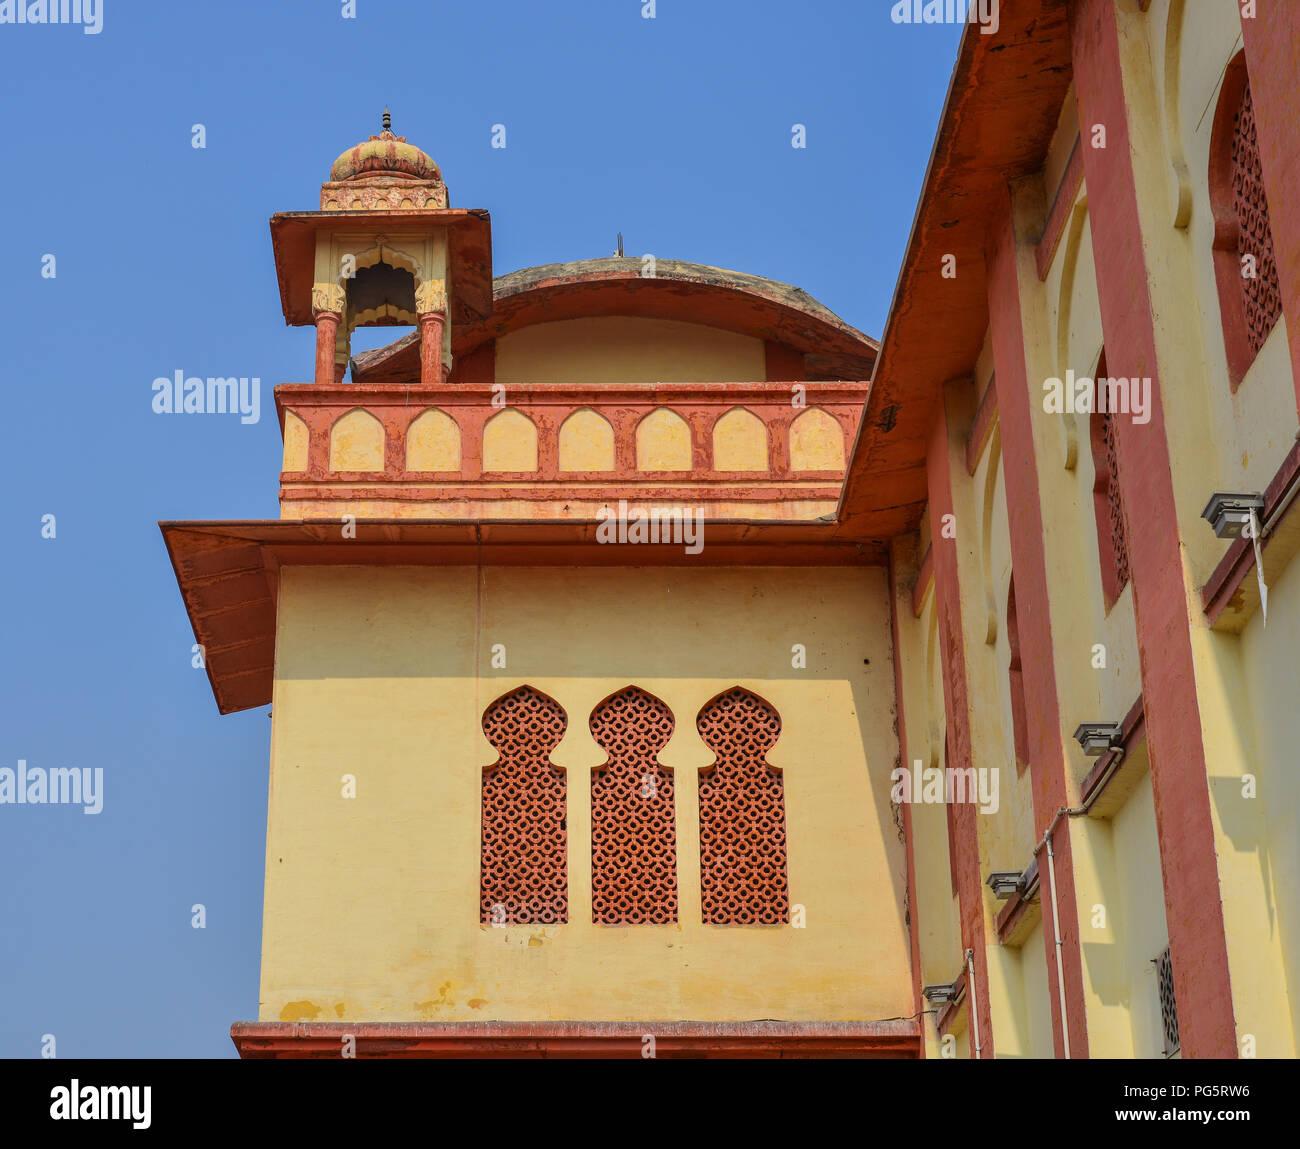 Pushkar, India - Nov 5, 2017. Details of an old palace at downtown in Pushkar, India. - Stock Image